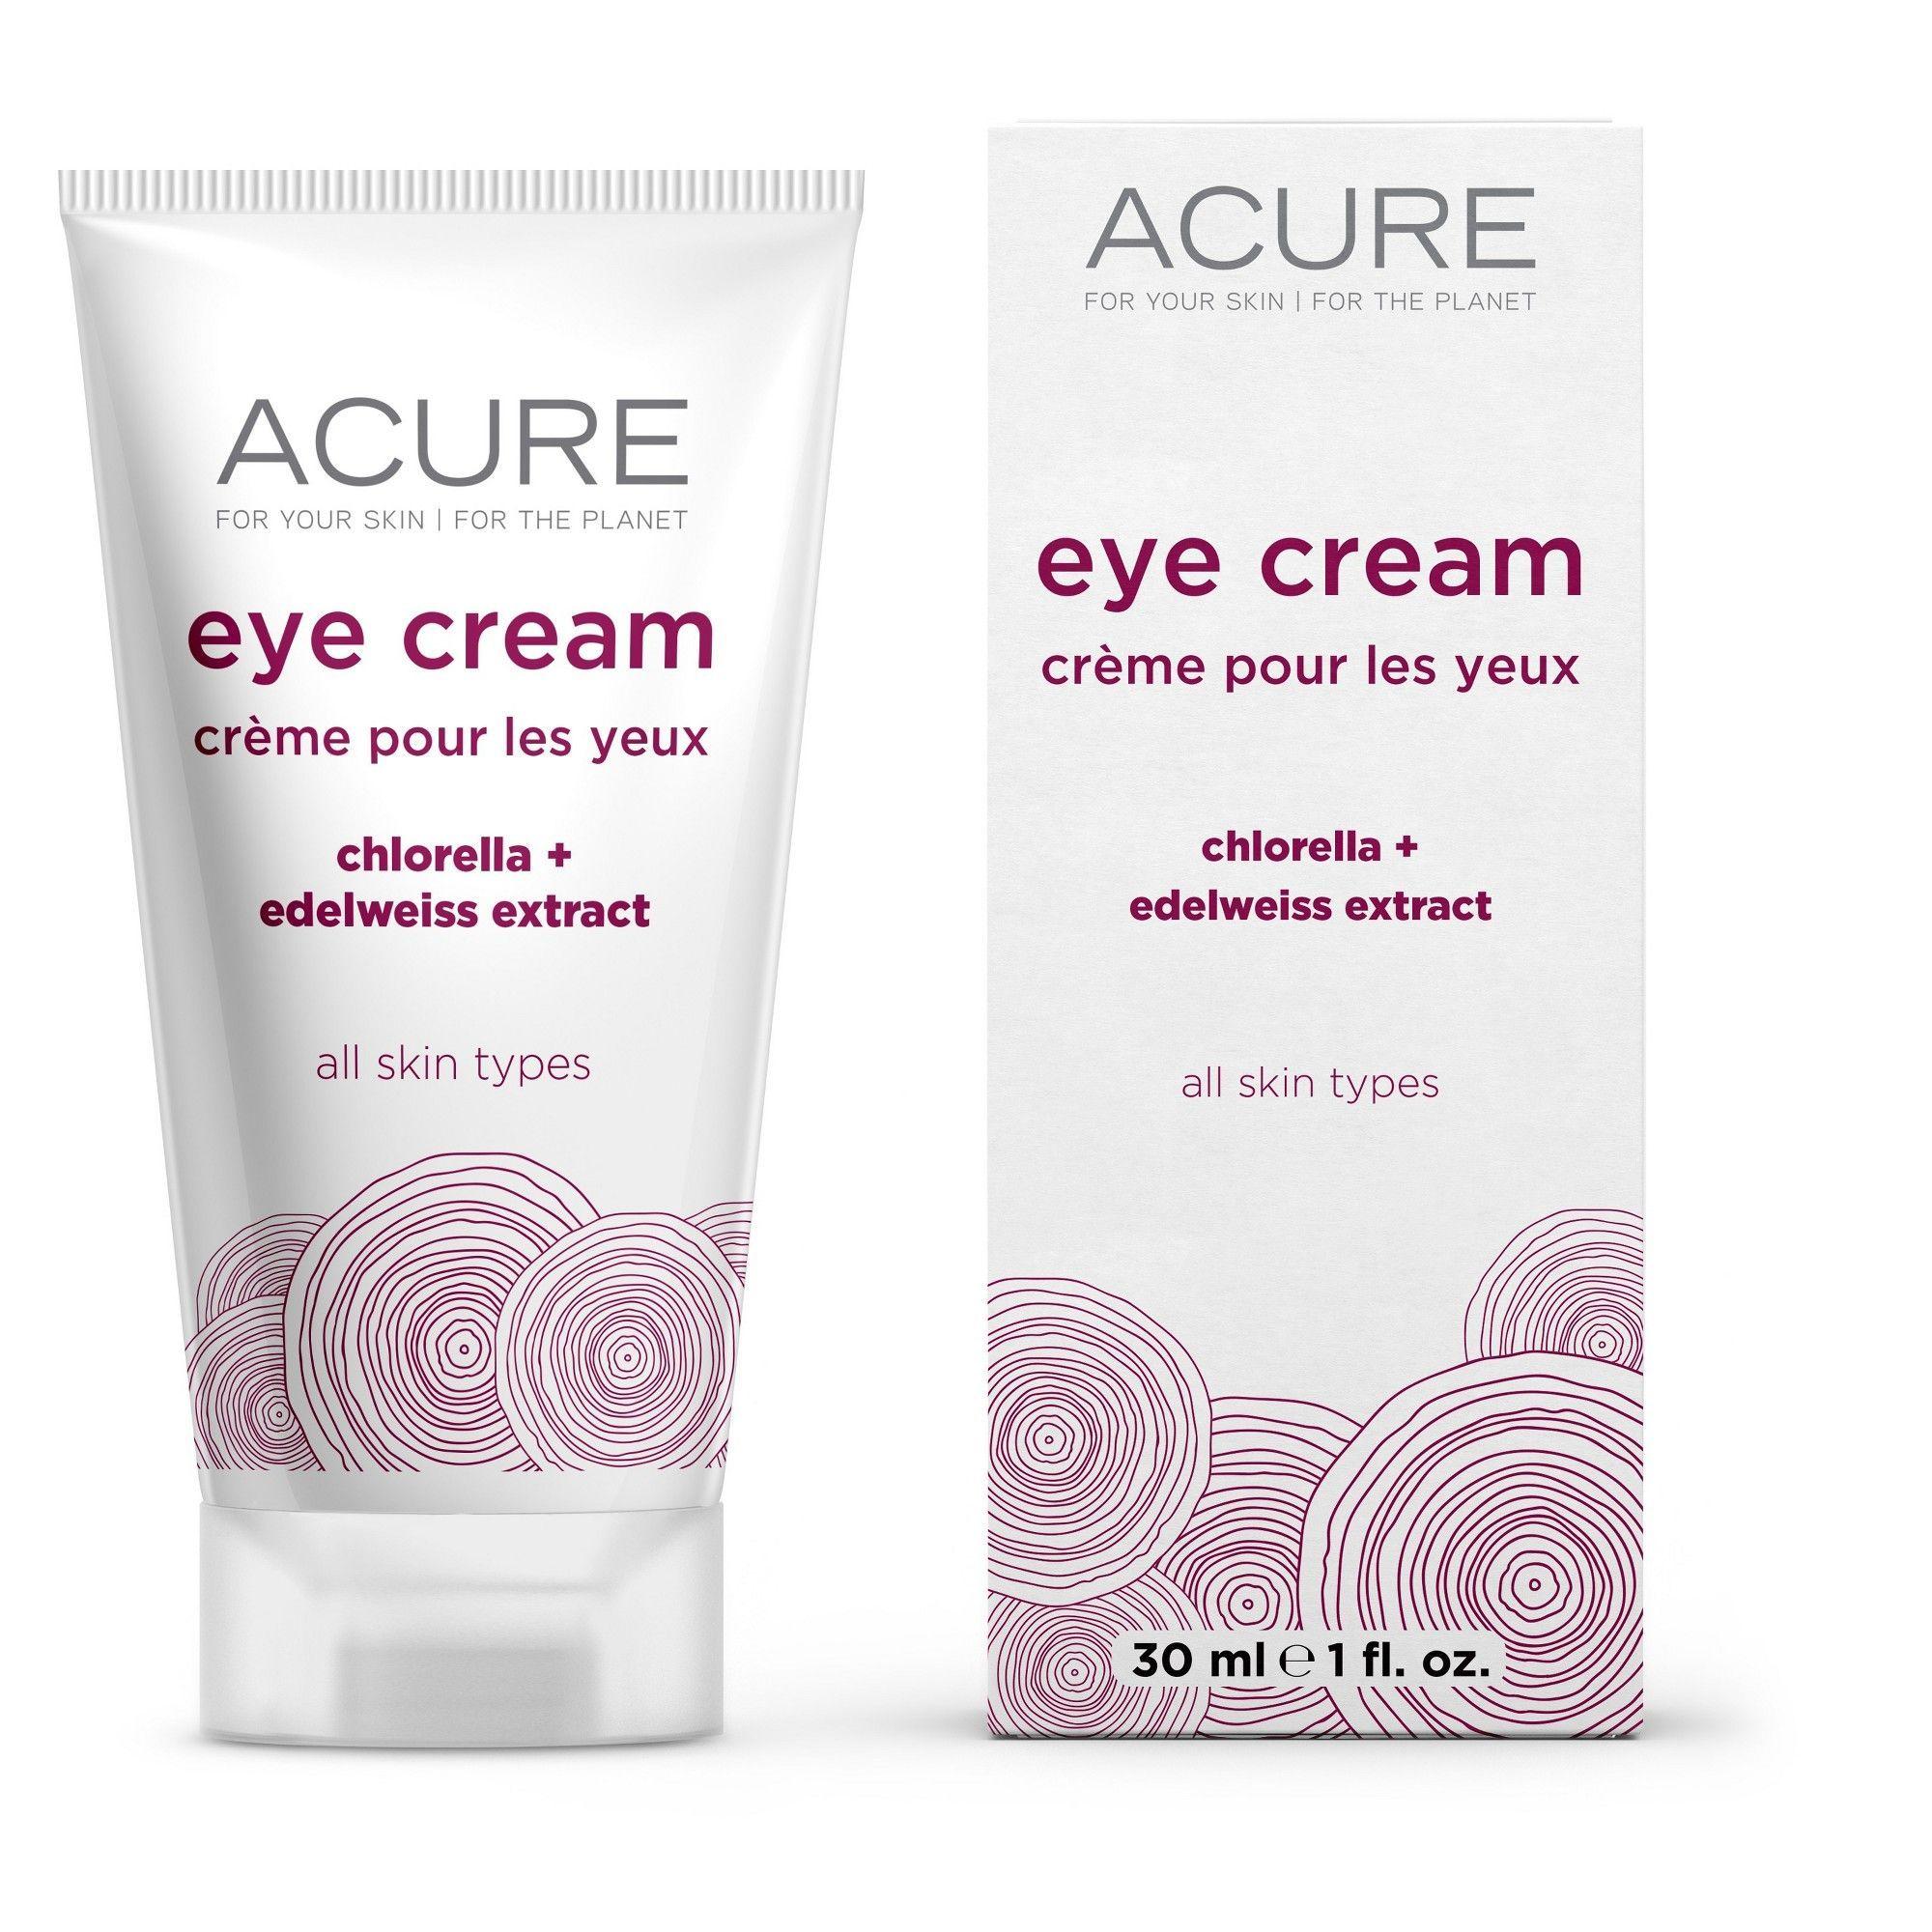 Acure Organics Eye Cream Superfruit + Cgf - 1 Oz